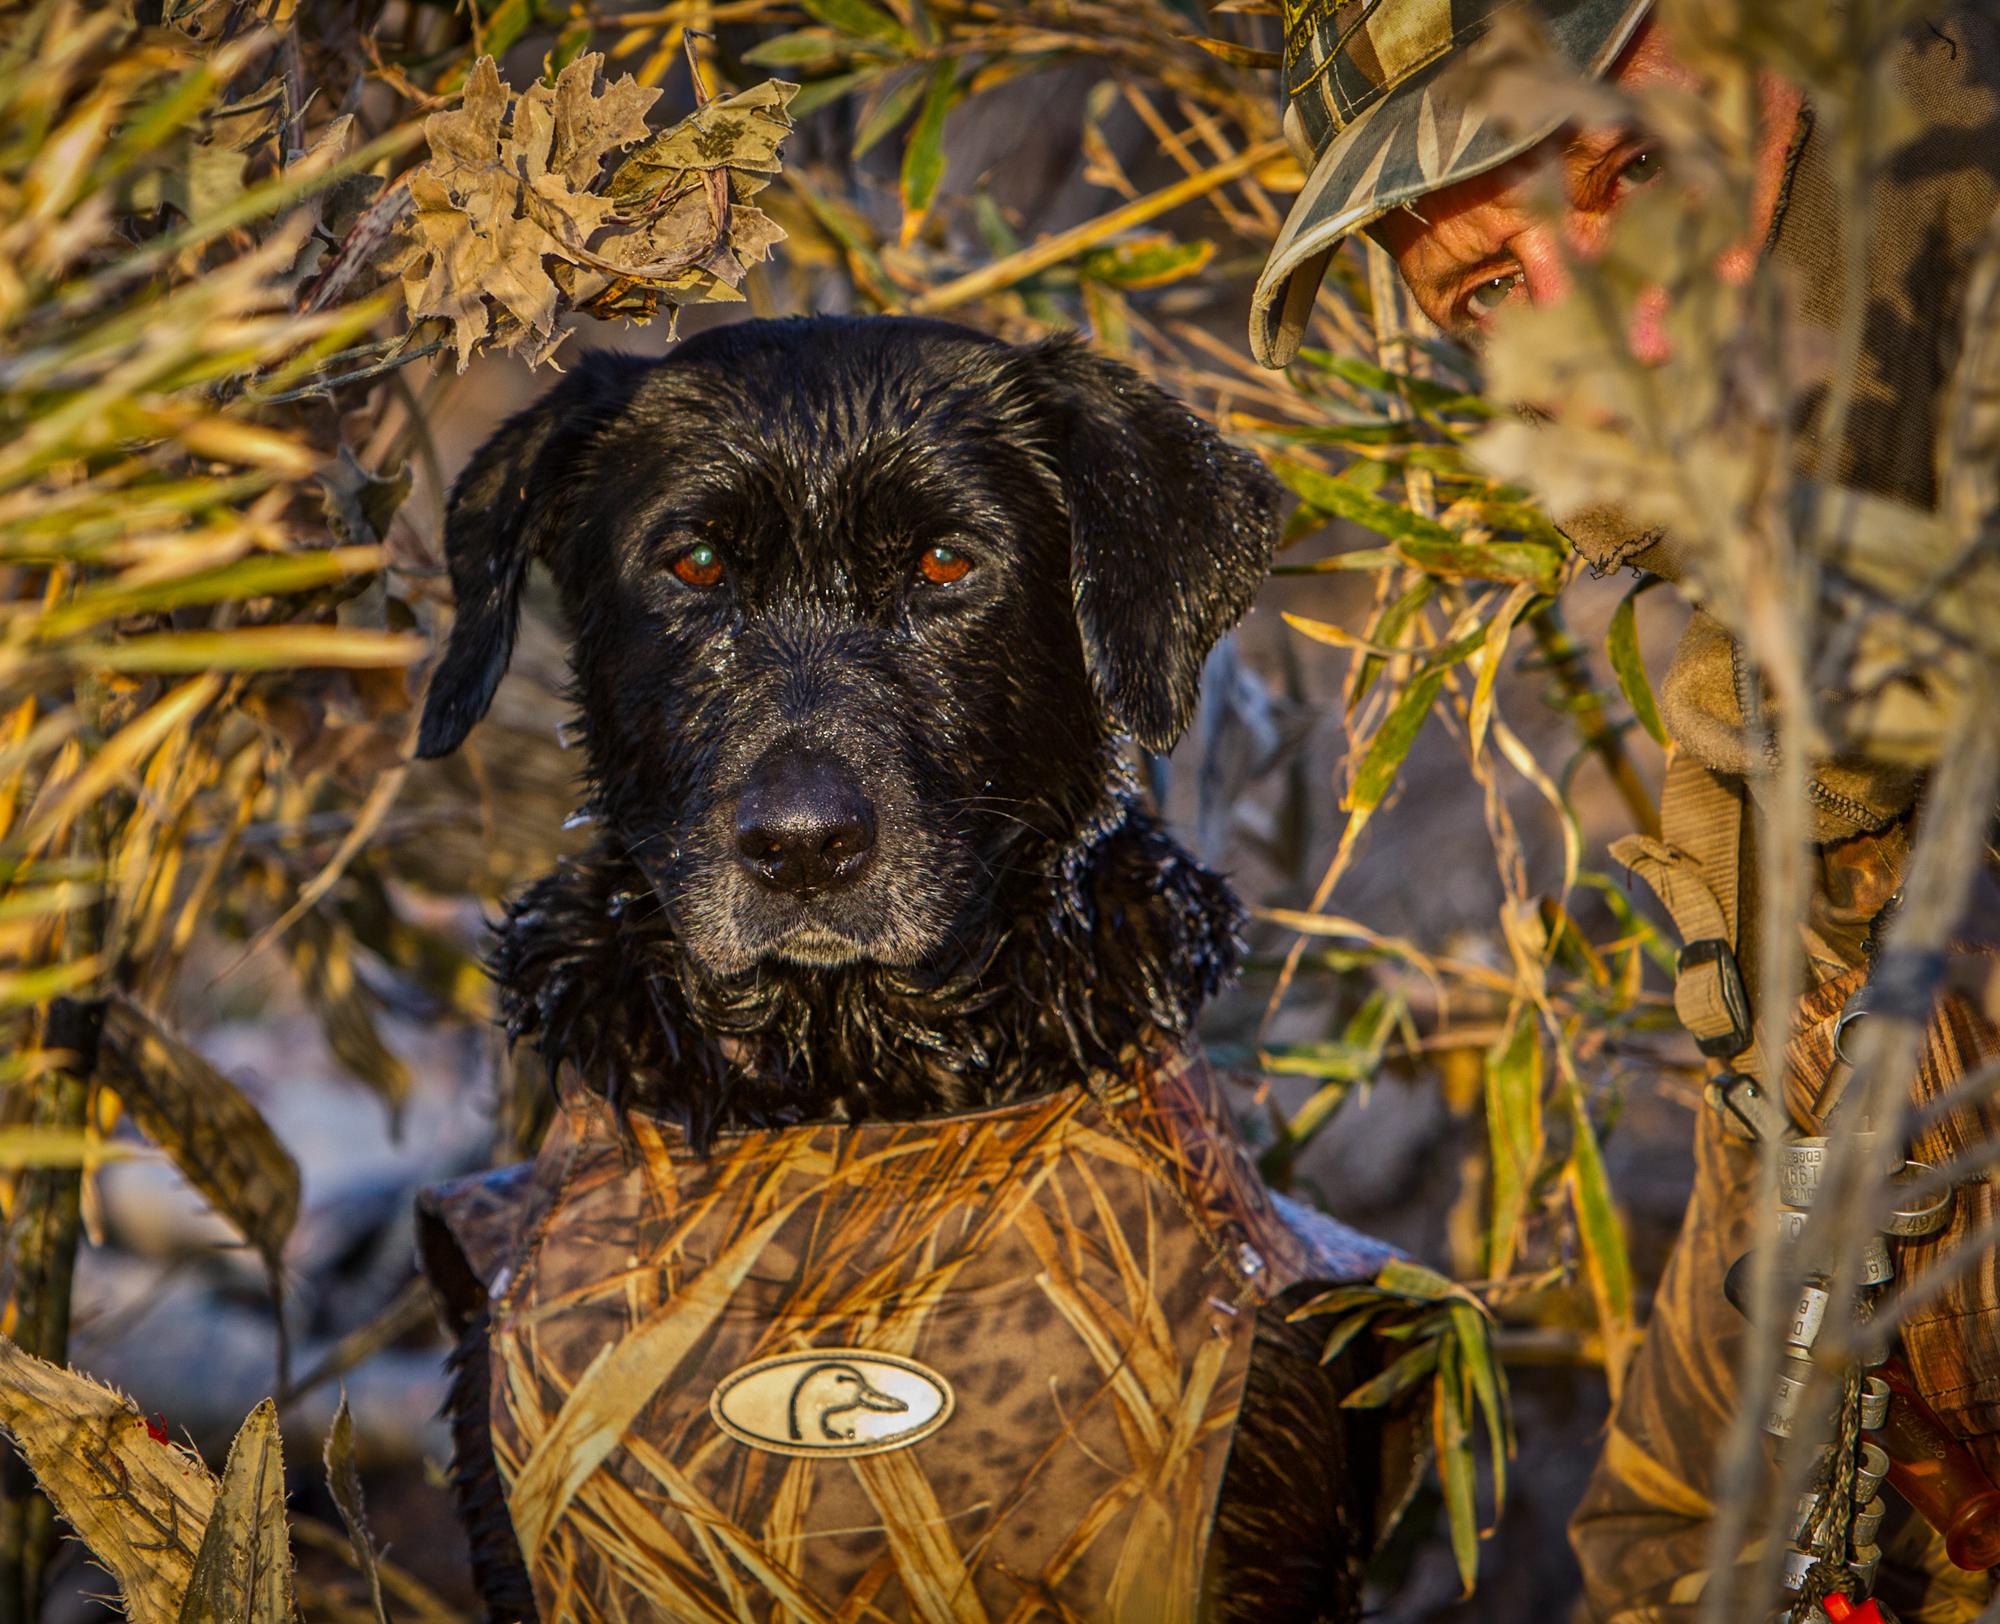 rick-meoli-commercial-photographer-outdoor-animal-lifestyle-repheads-20